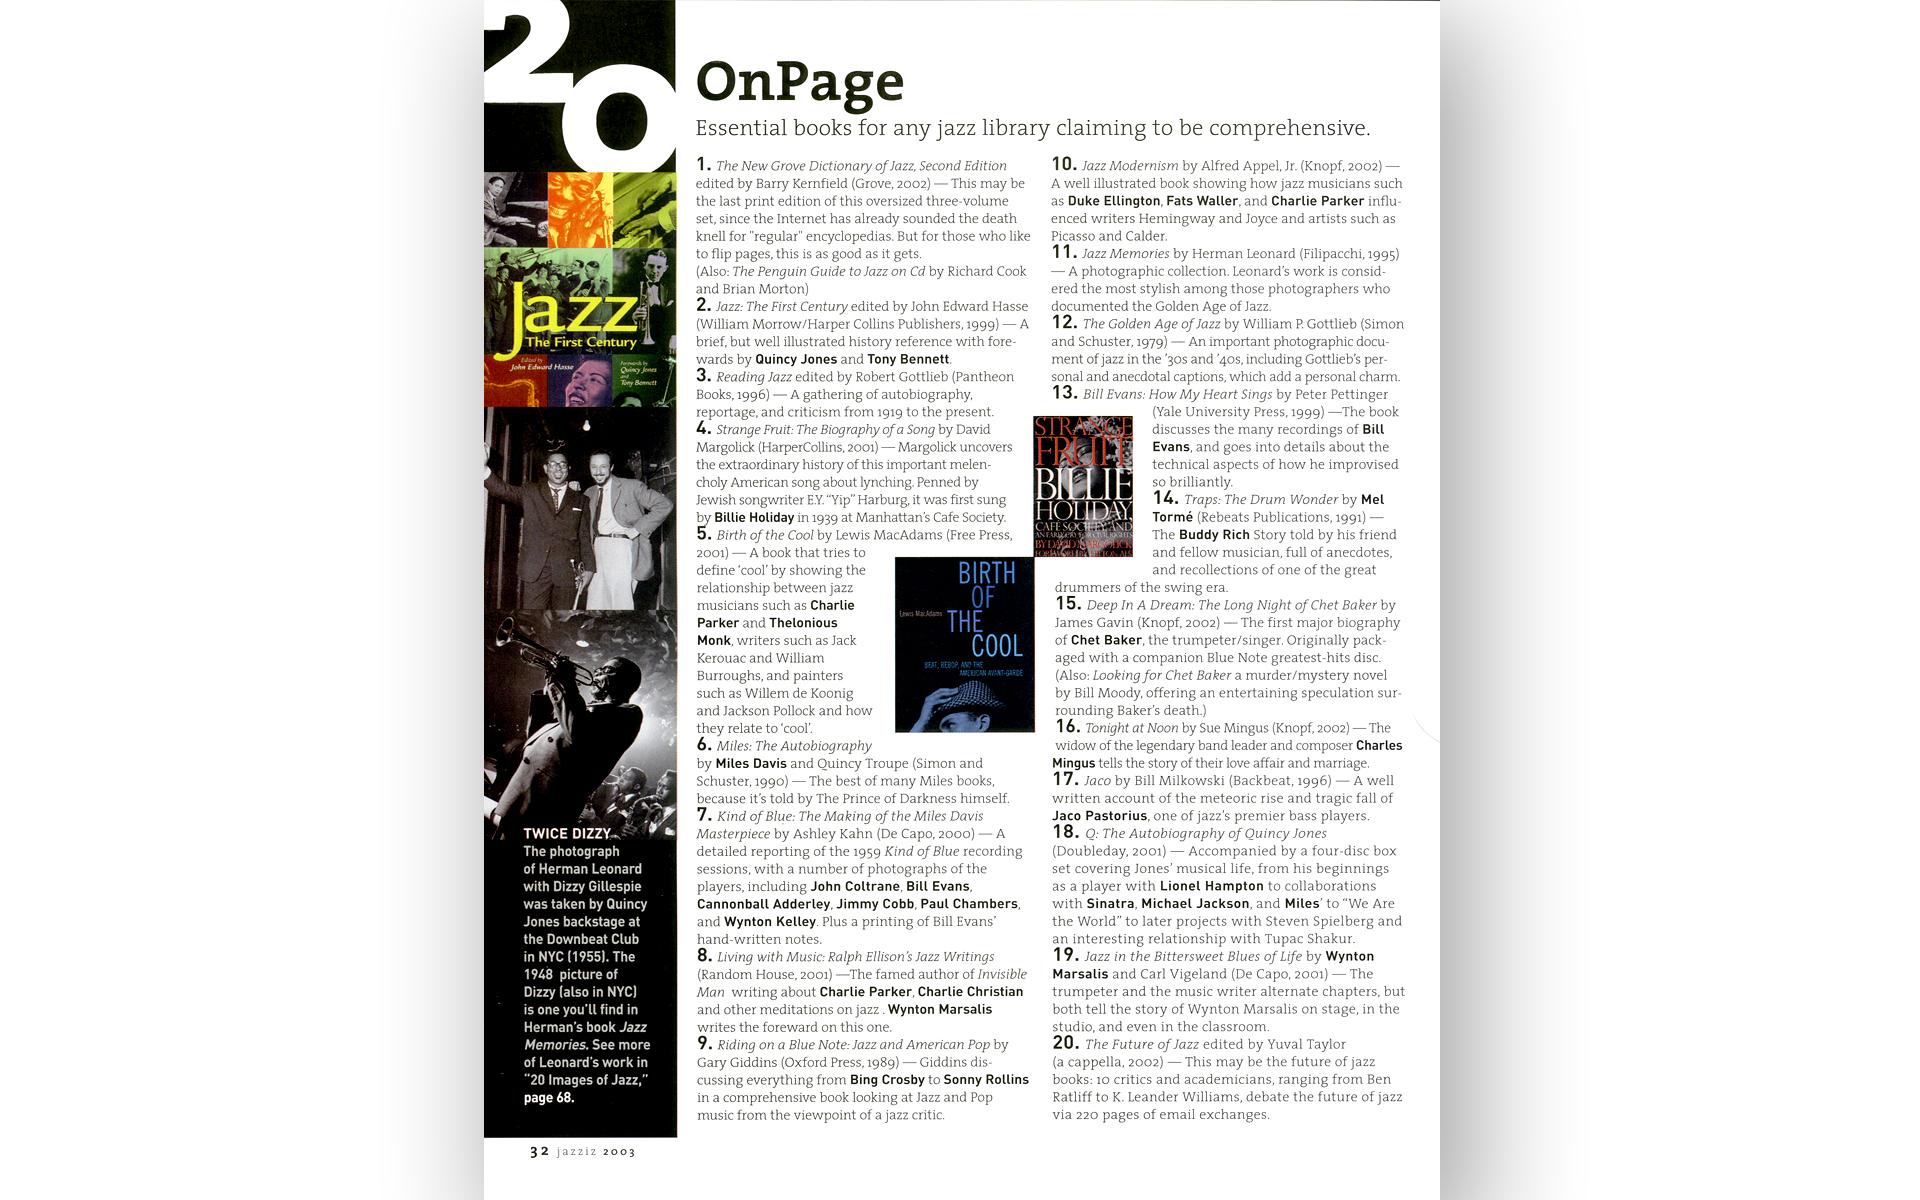 12-OnPage